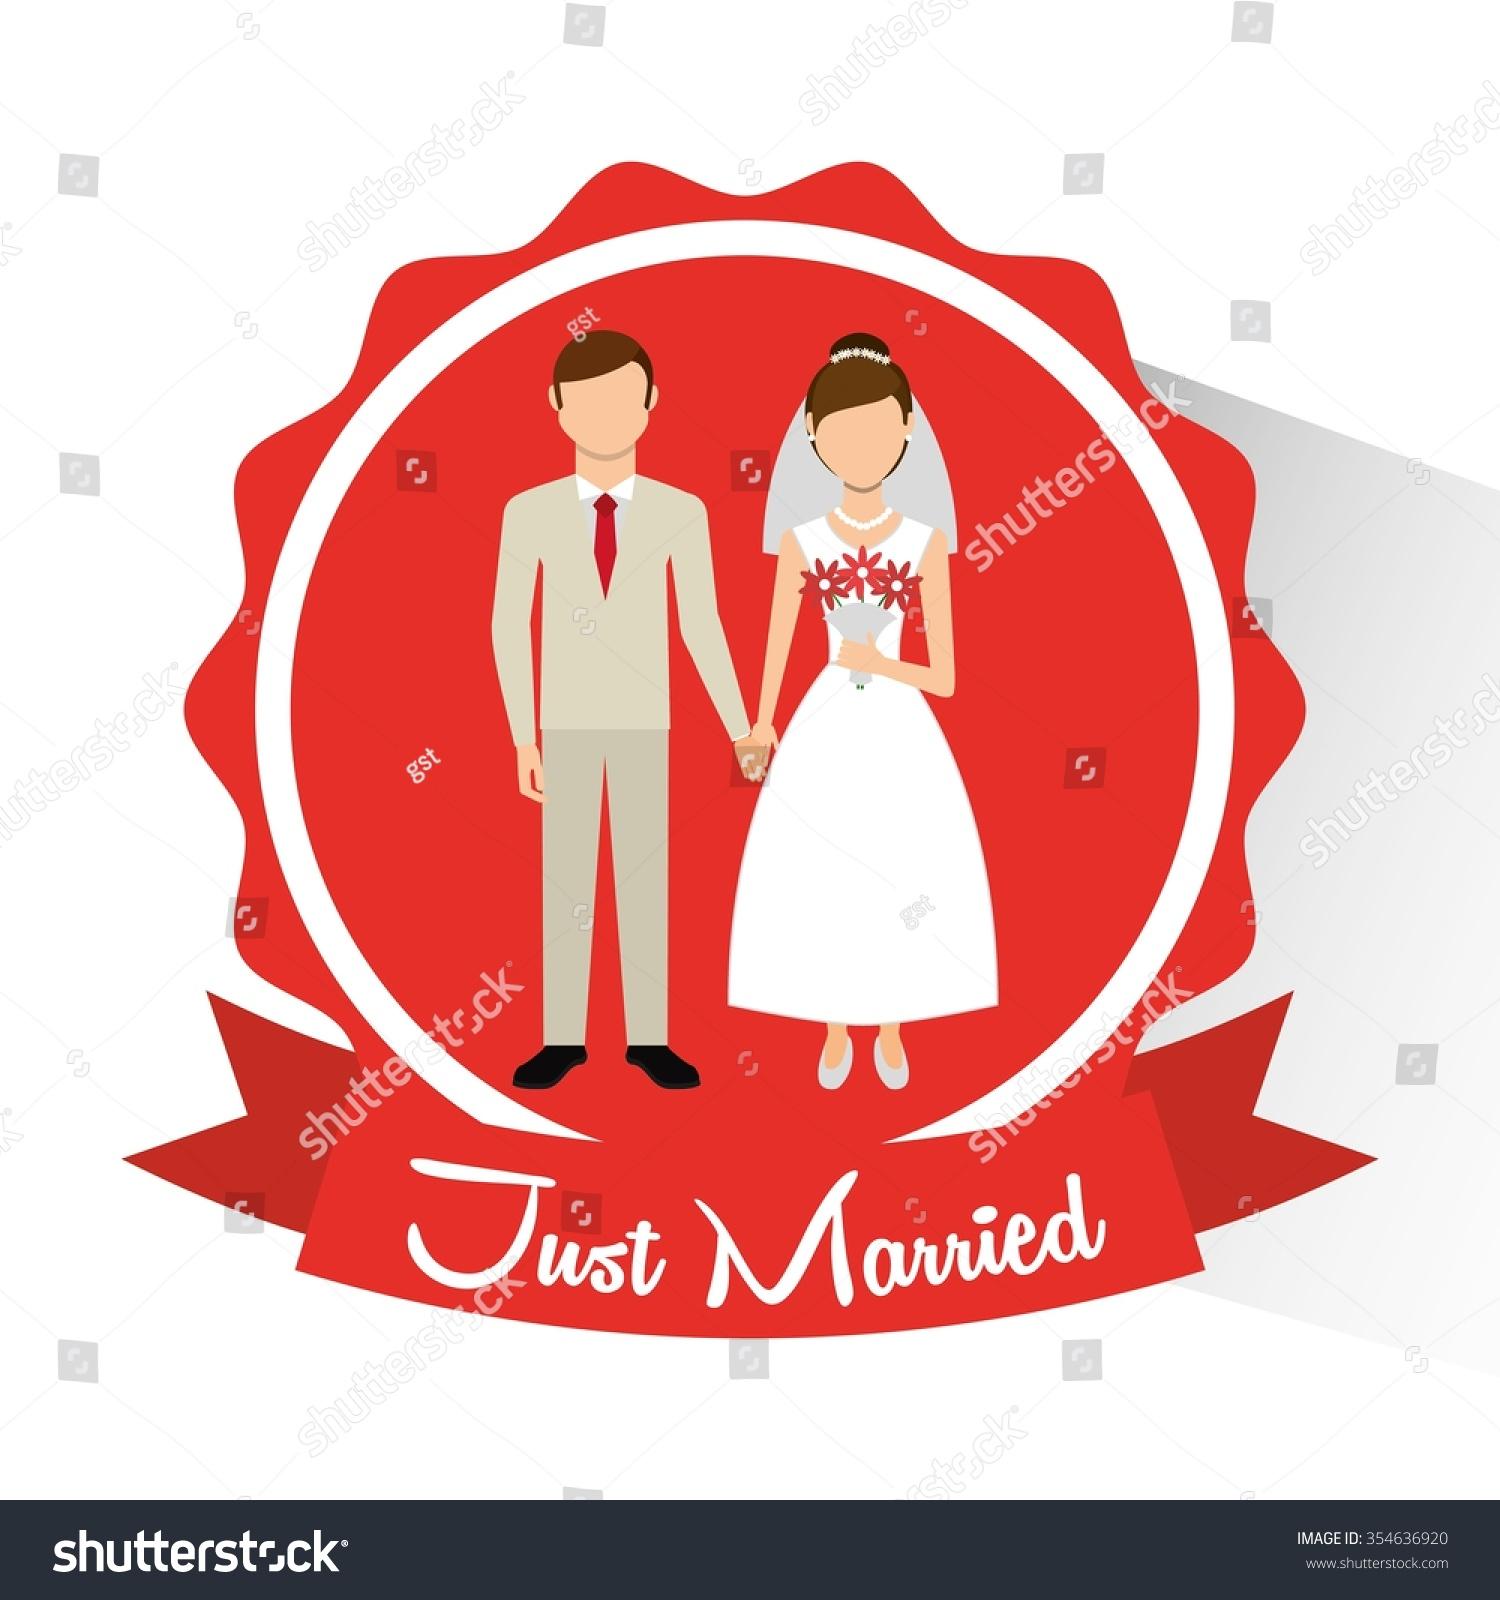 Wedding Invitation Design Vector Illustration Eps 10 Stock Vector HD ...